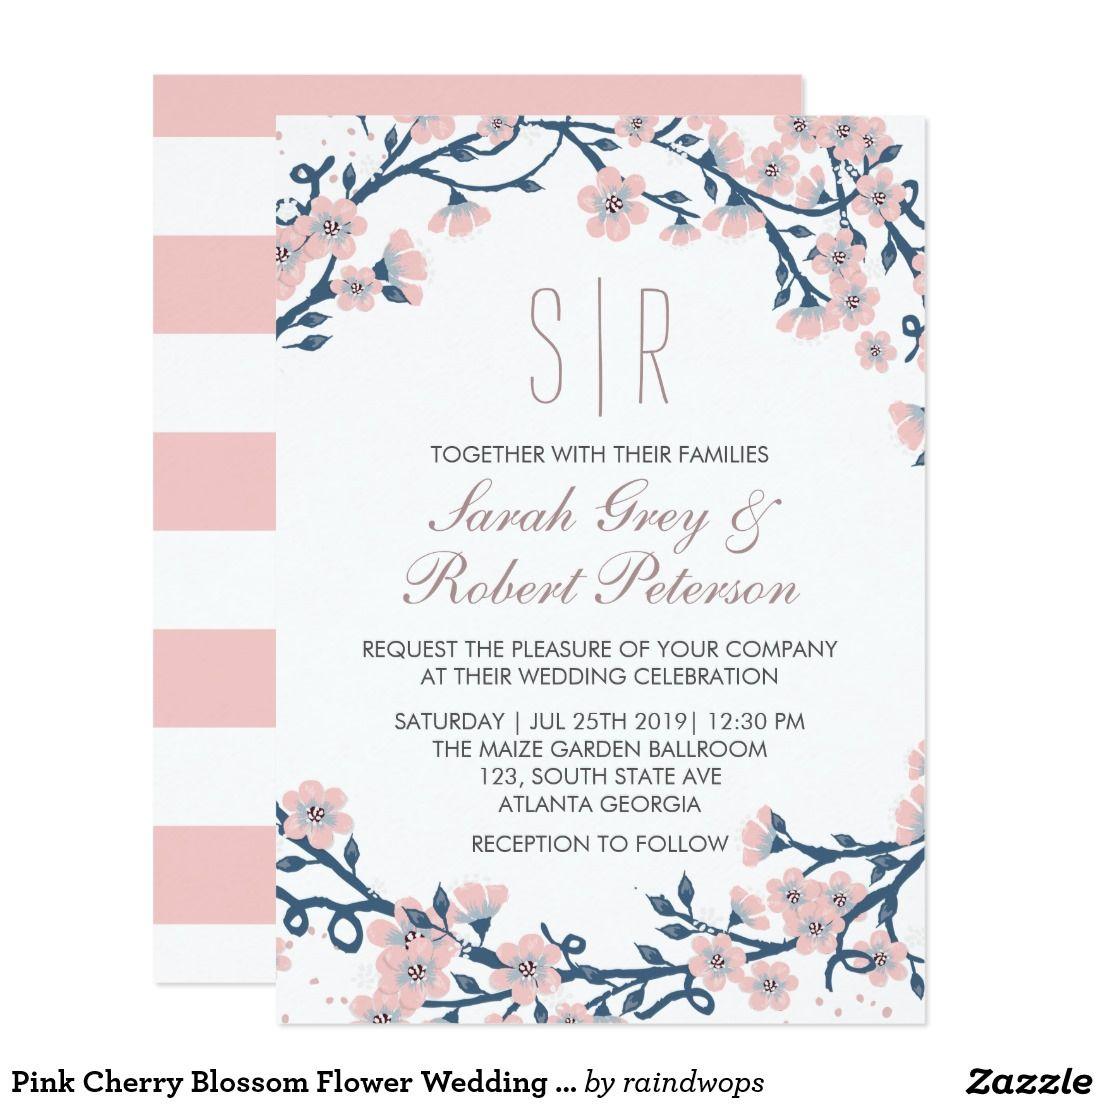 Pink Cherry Blossom Flower Wedding Invitation   invitations ...